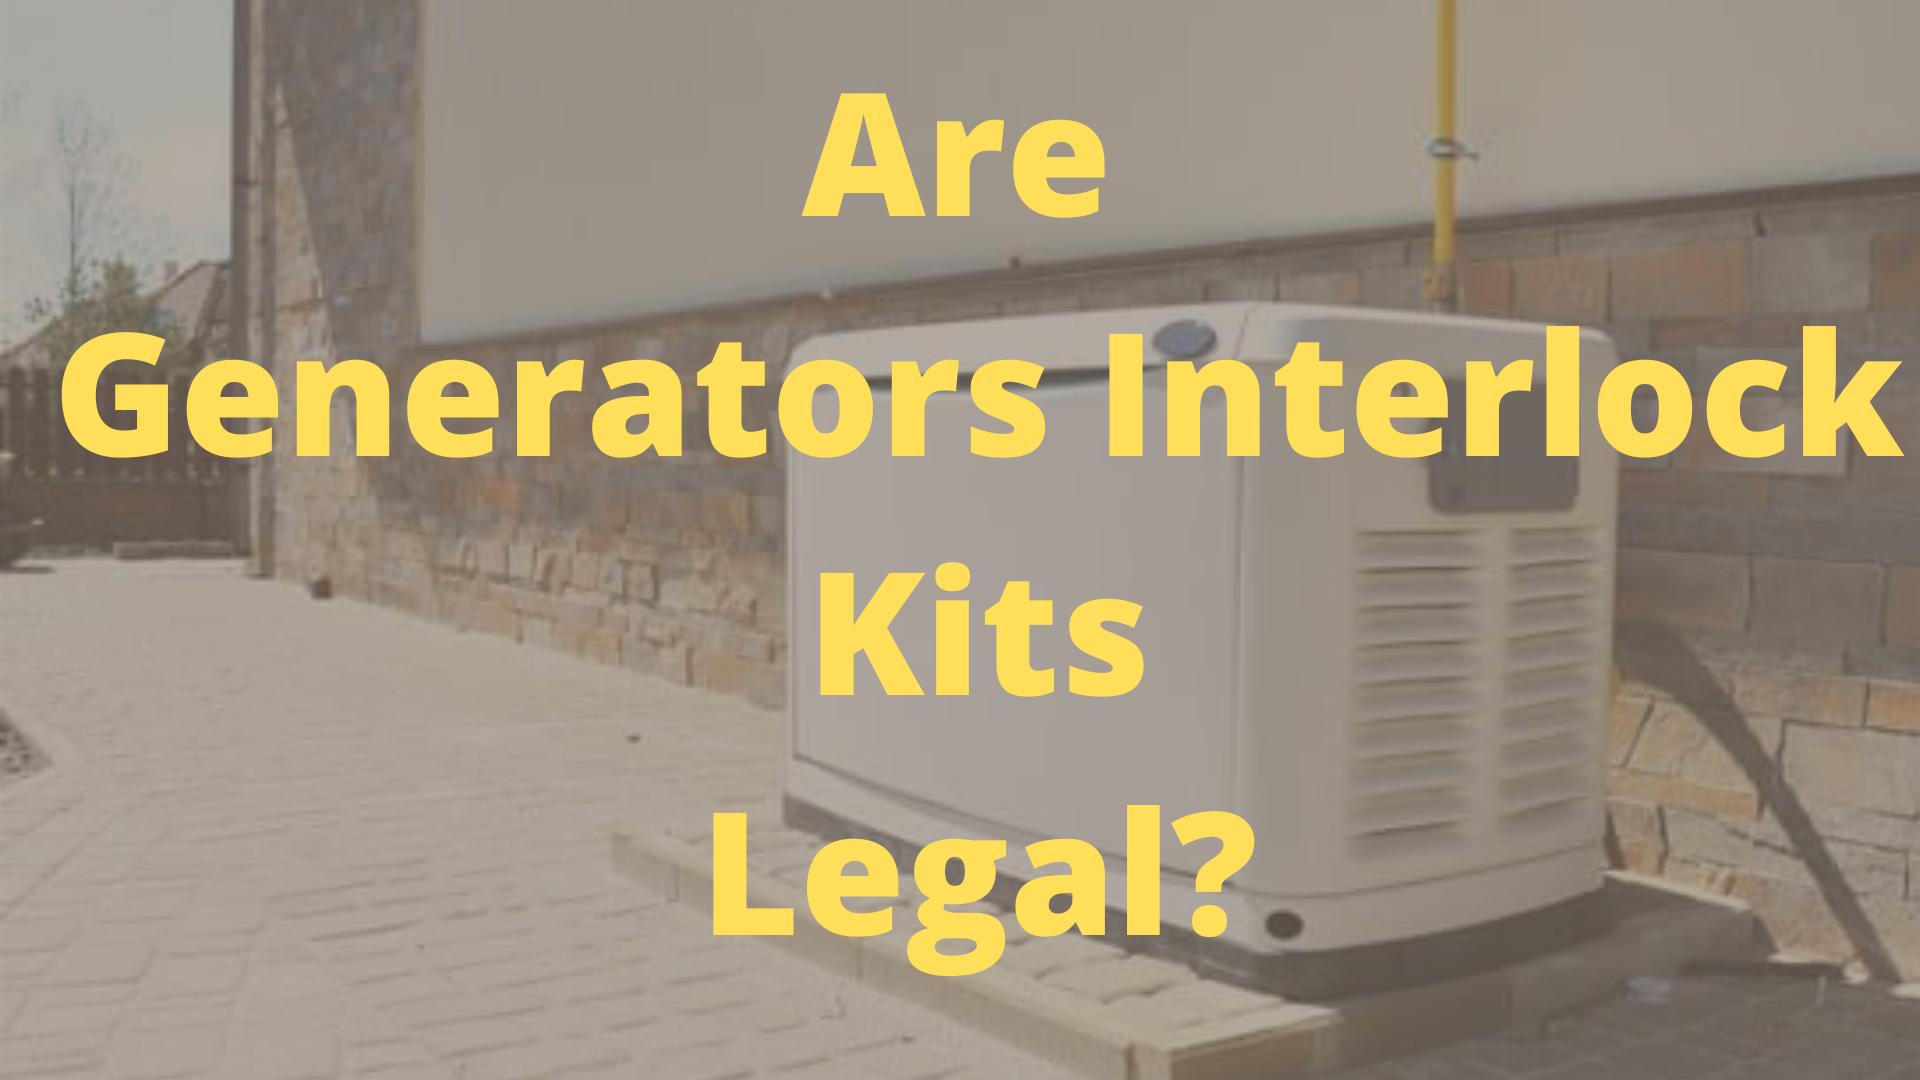 are generator interlock kits legal in florida, Michigan, California, New York, Virginia, Ohio, Texas, New Jersey, nc